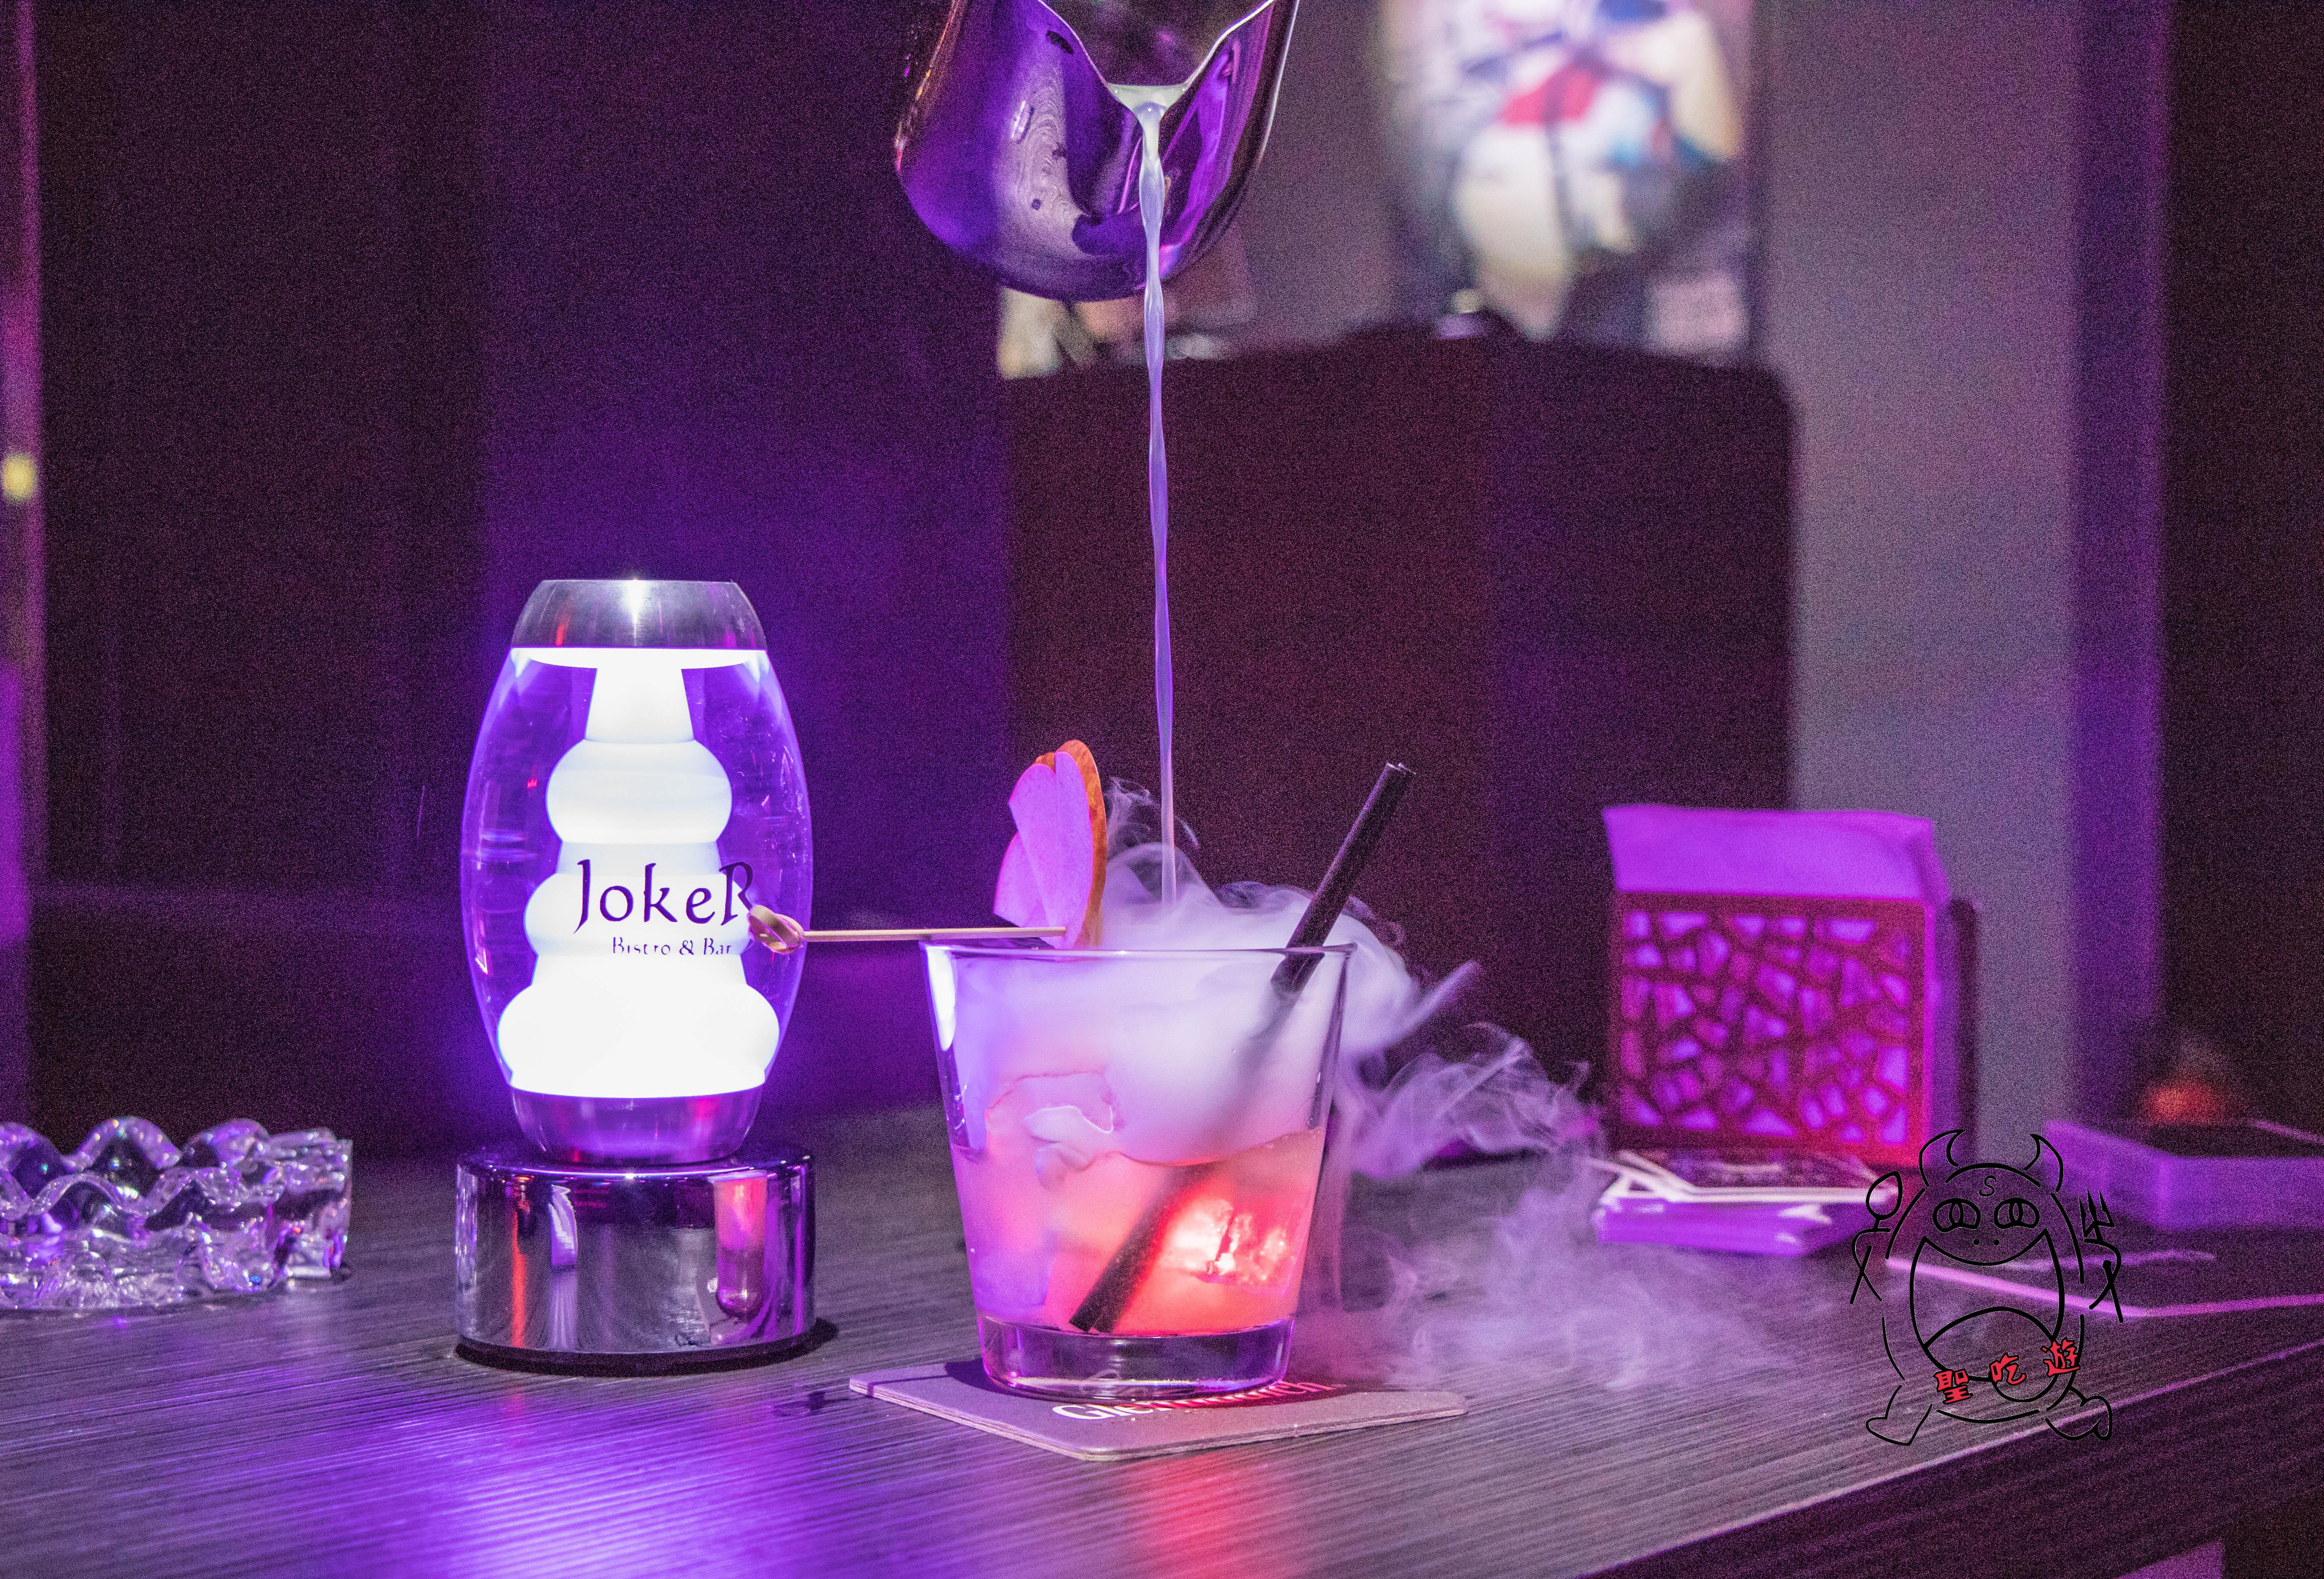 JokeR Bistro & Bar